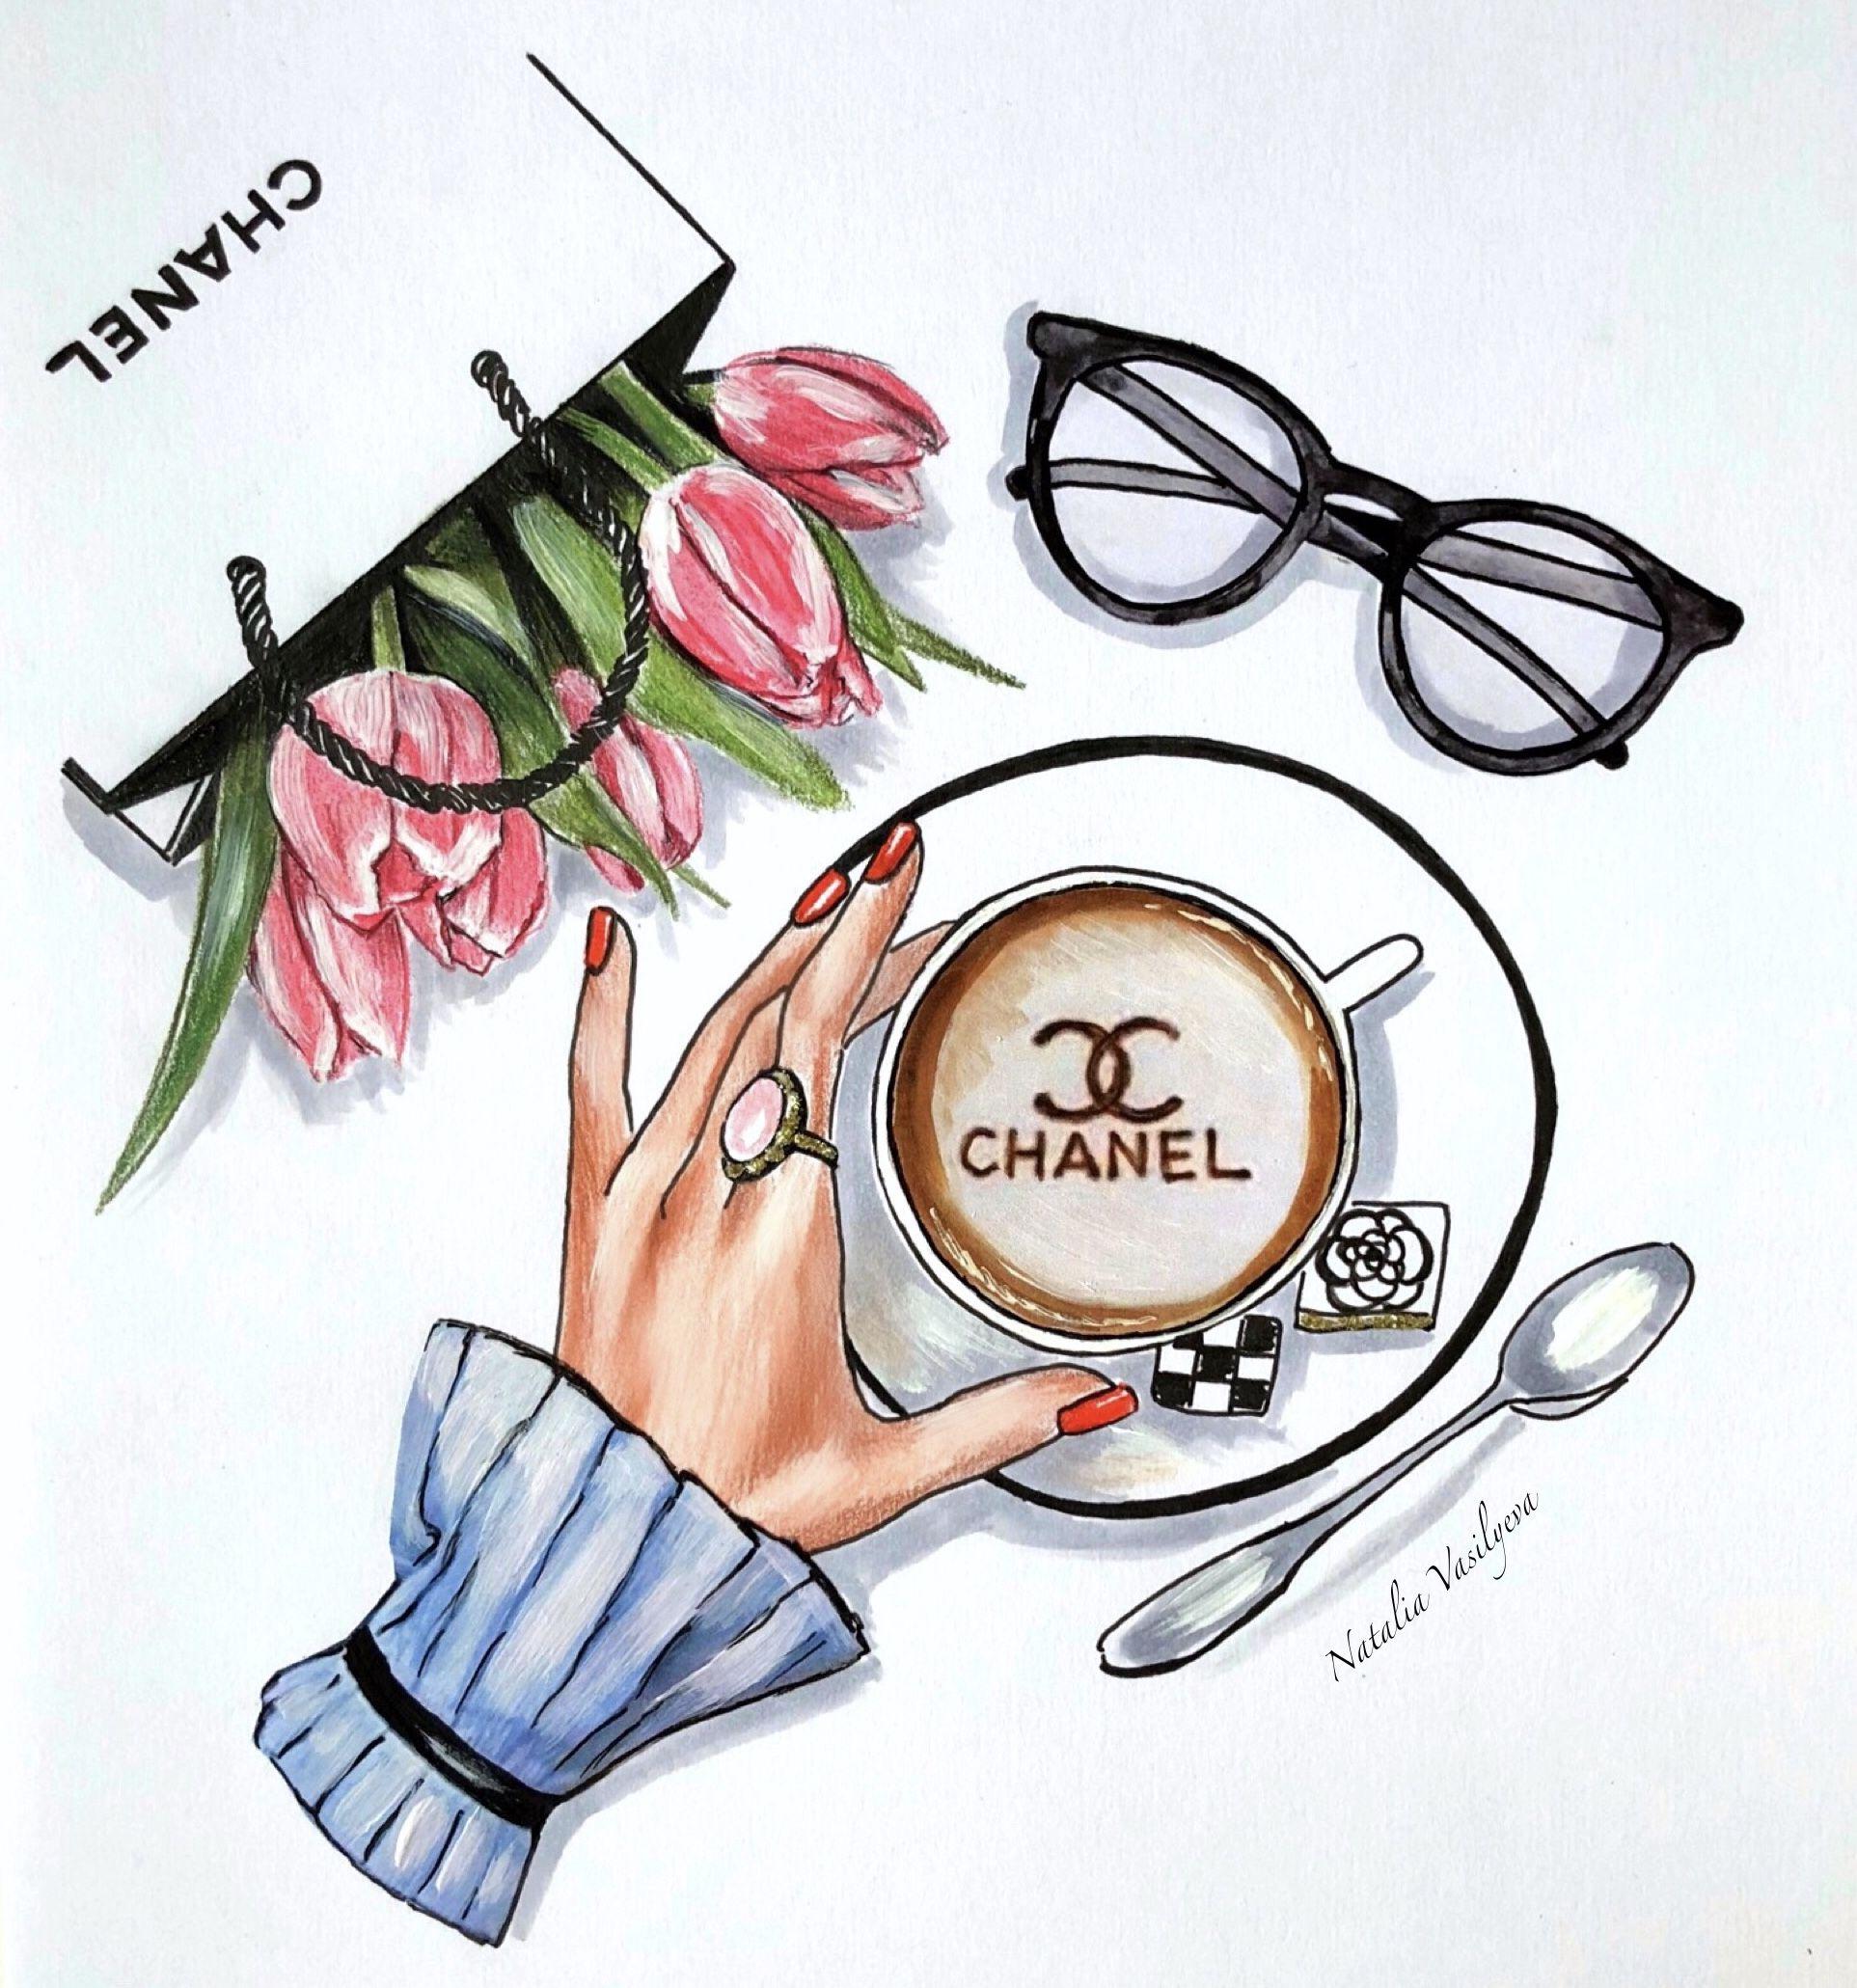 Coffee time Модные иллюстрации, Картинки